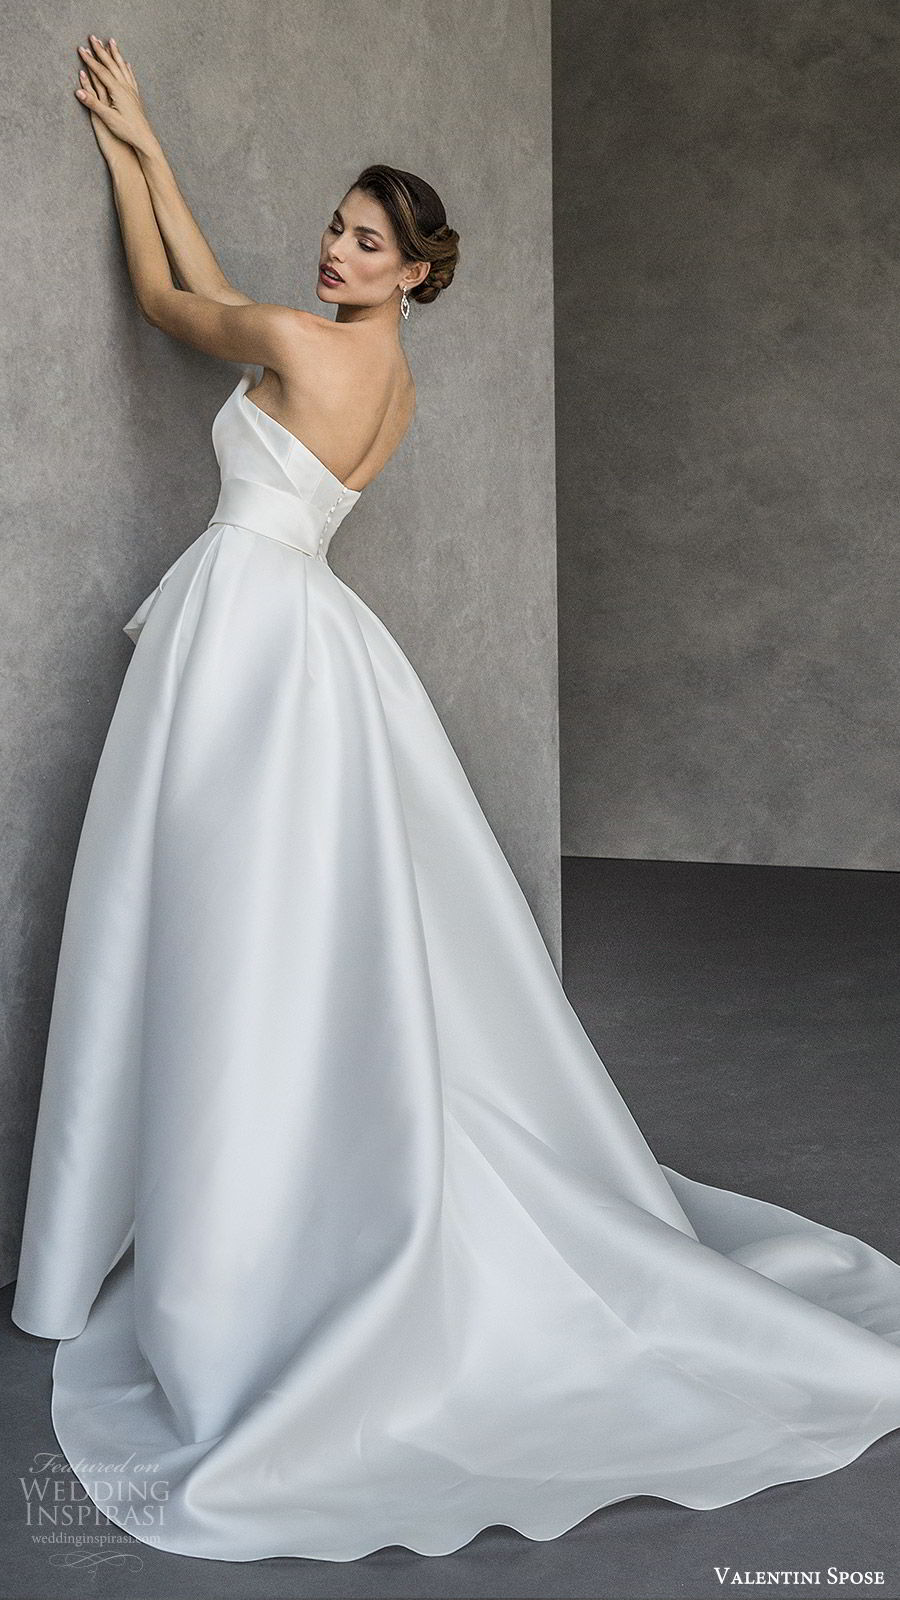 valentini spose spring 2020 bridal strapless sweetheart neckline slit skirt a line ball gown wedding dress (20) elegant modern chapel train bv